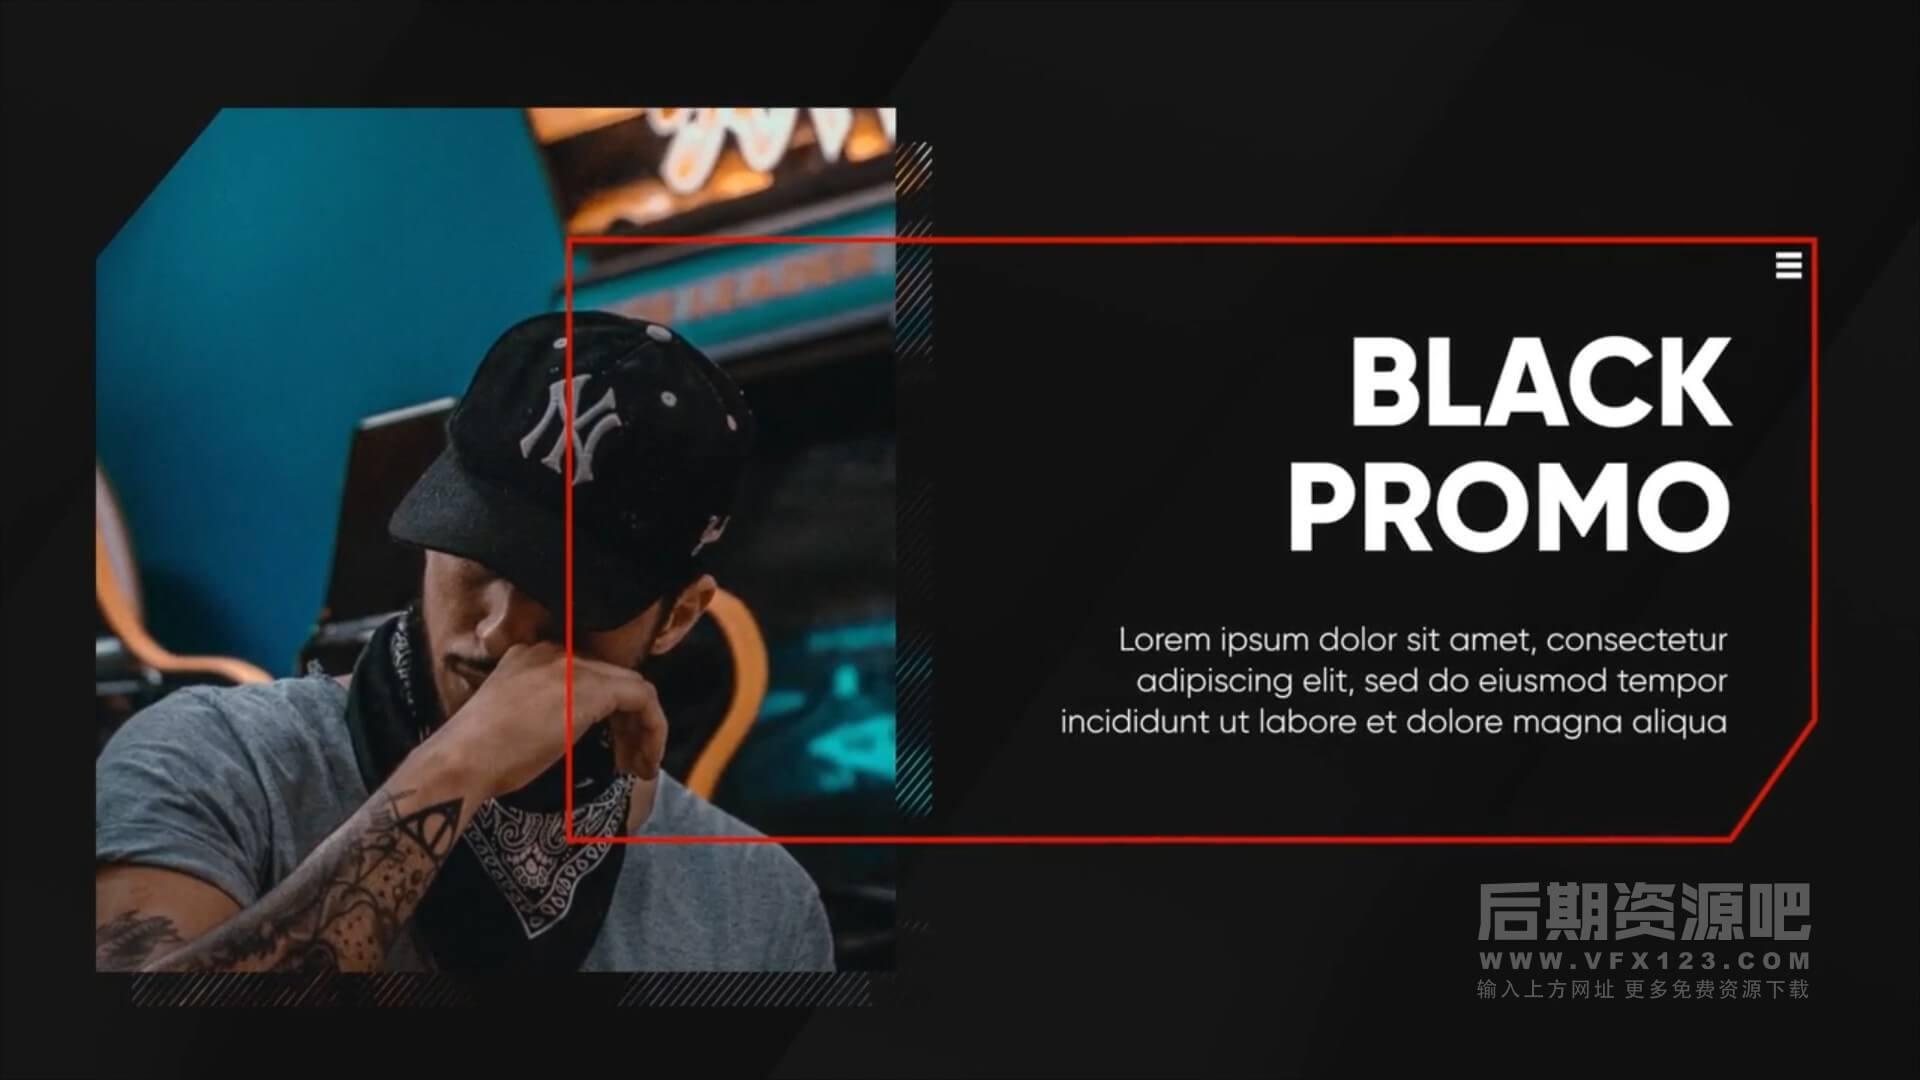 Fcpx主题模板 黑白单色调企业商务类图文展示模板 Corporate Black Presentation